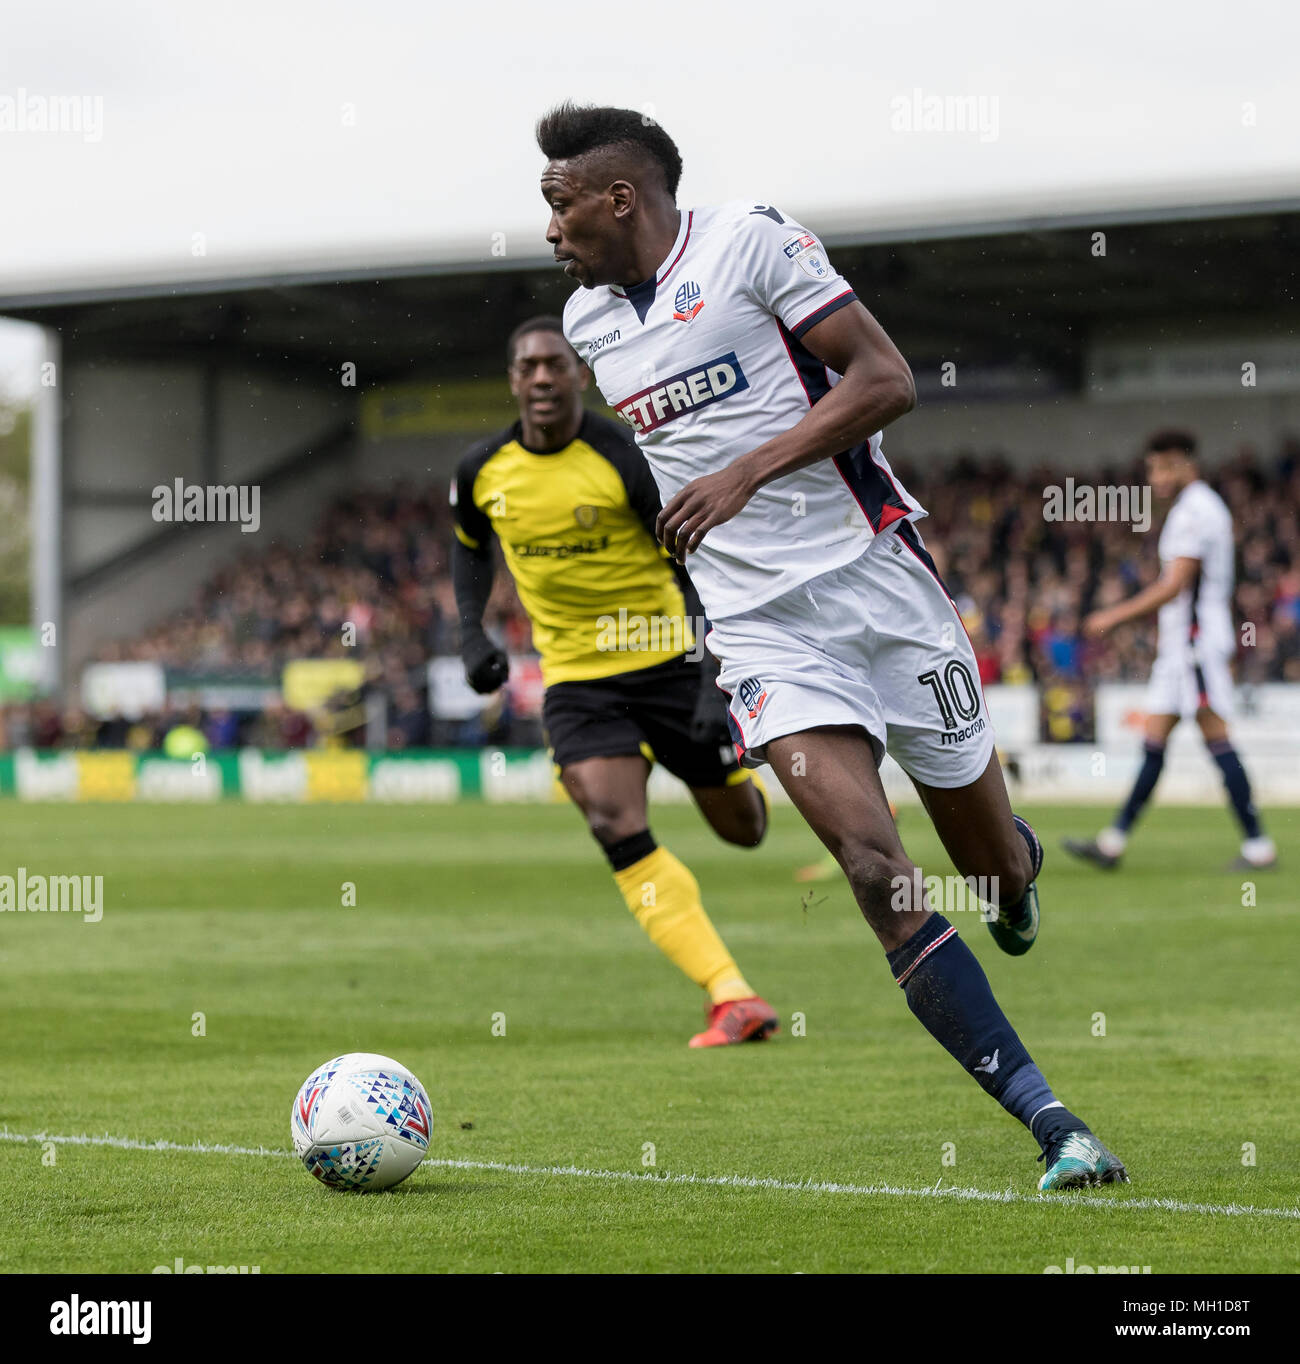 Sammy Ameobi, Bolton Wanderers. Sammy Ameobi playing football for Bolton Wanderers - Stock Image